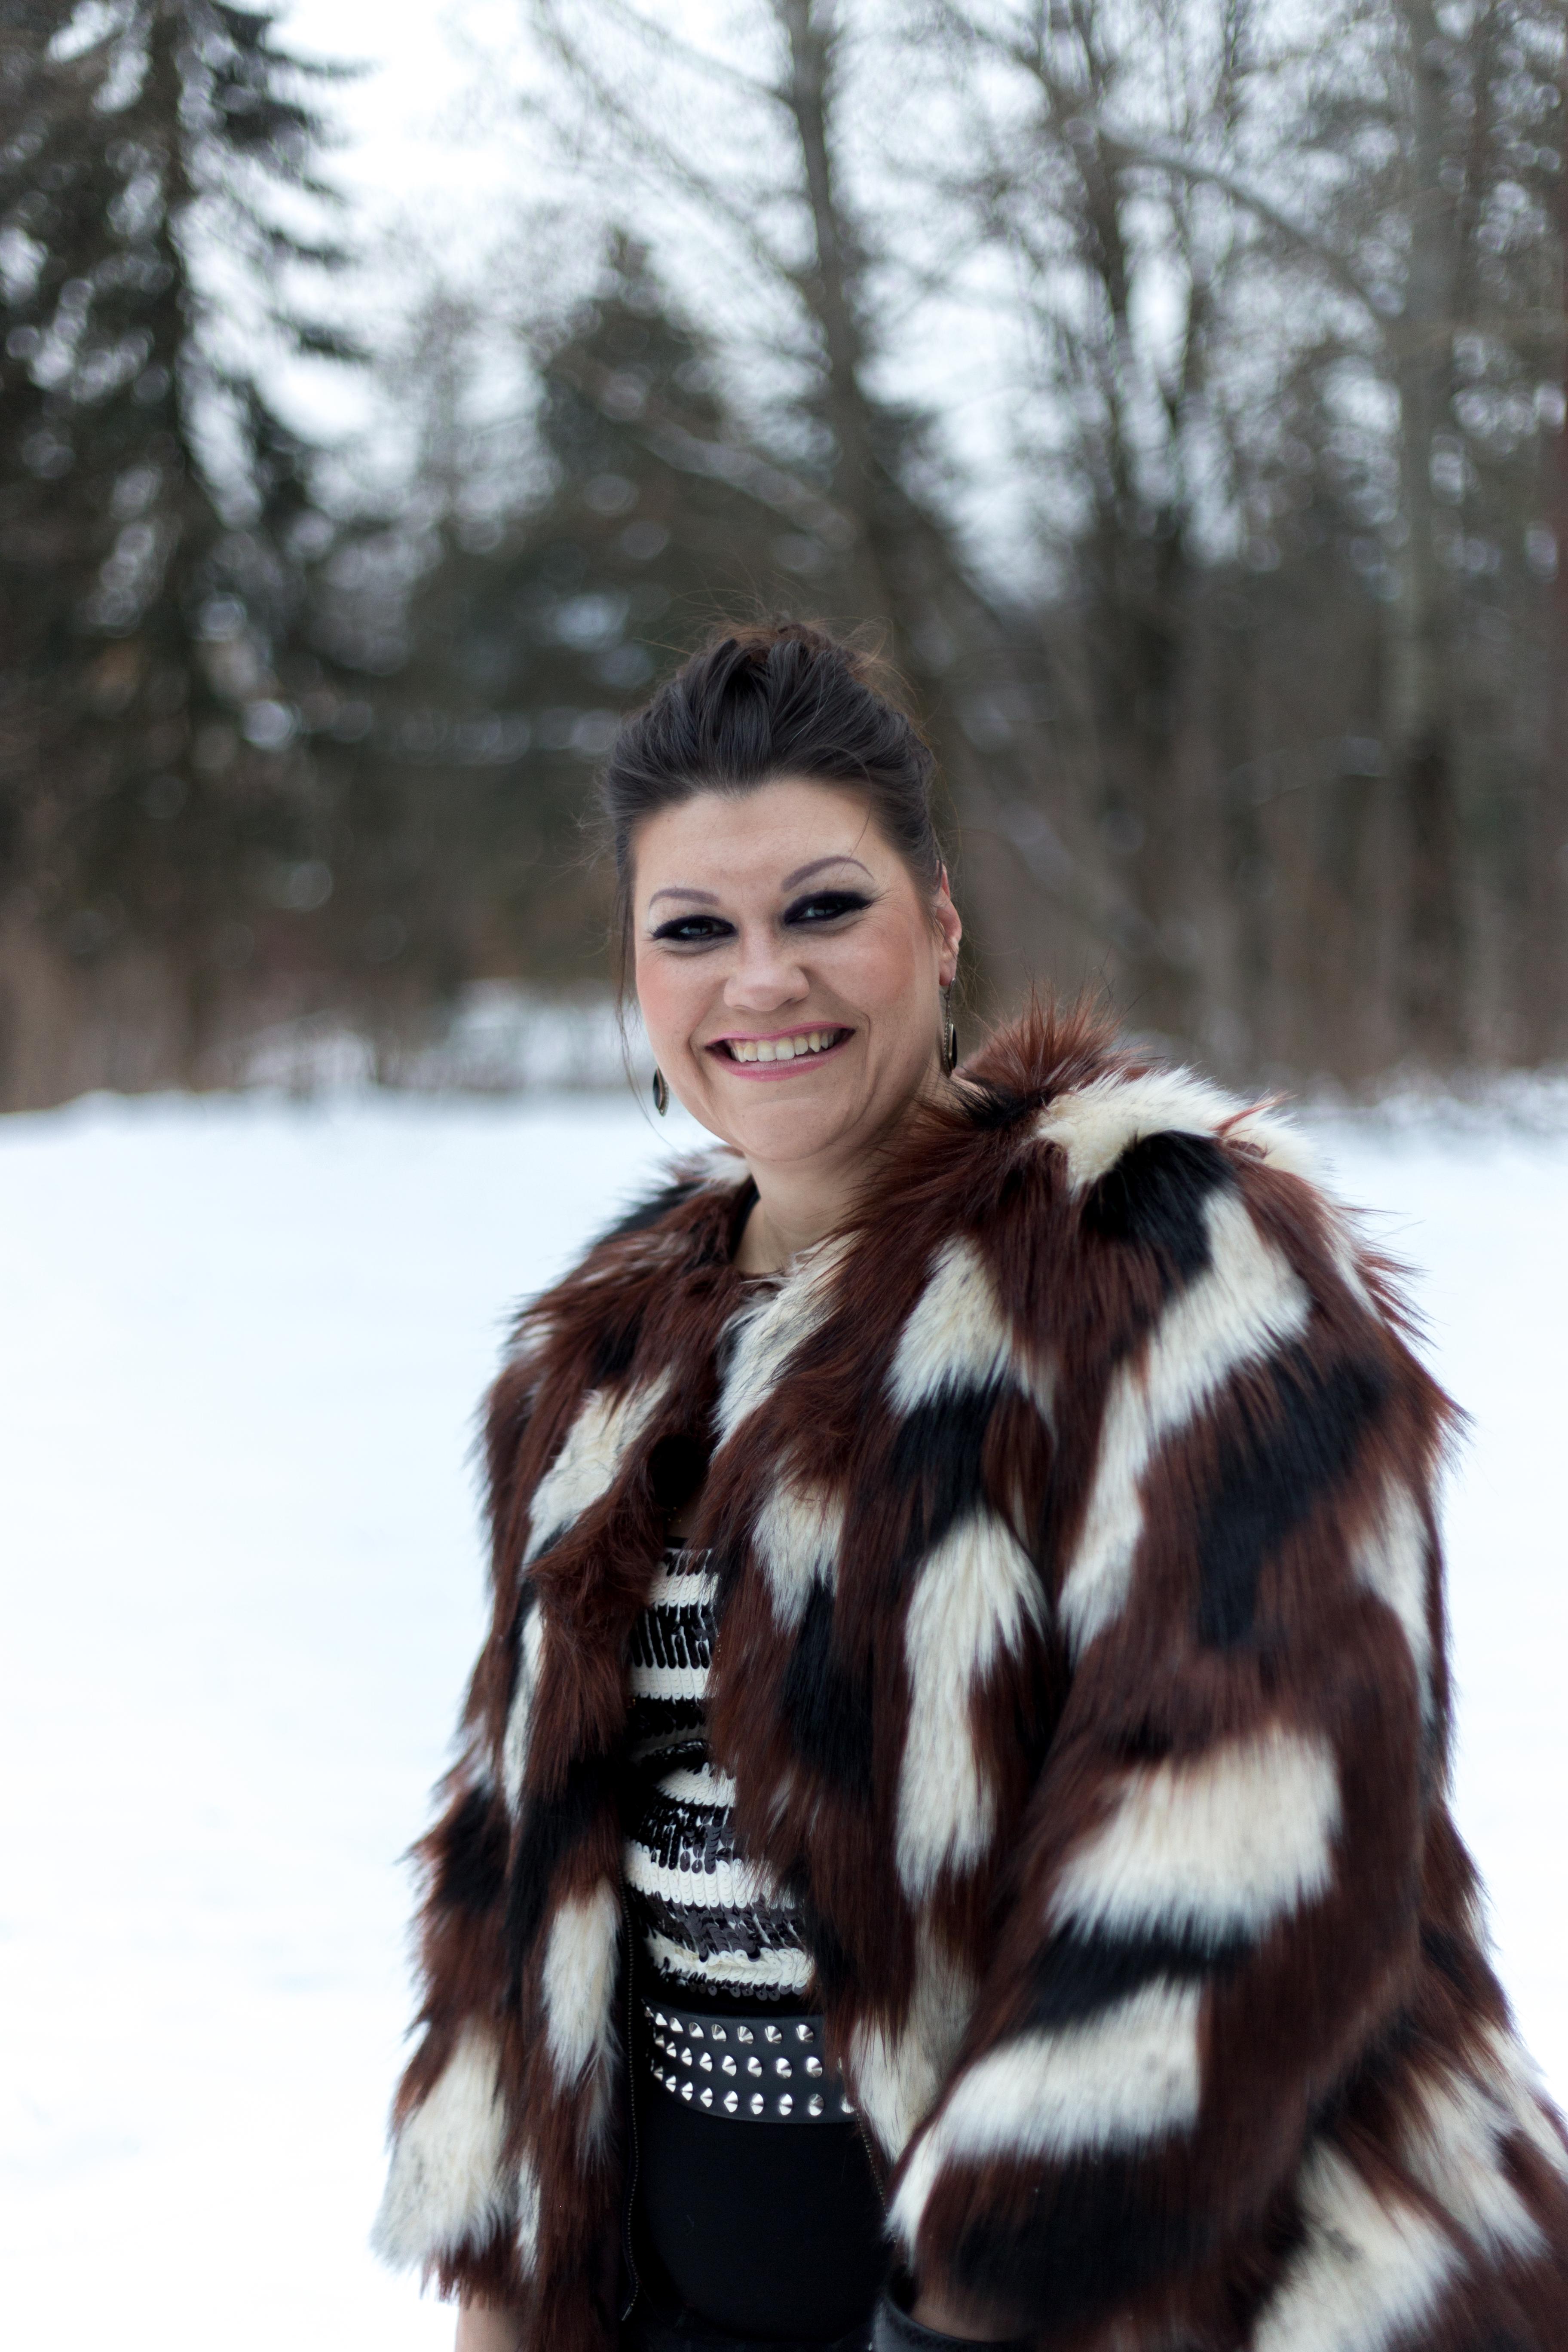 madonna blogger award navabi fauxfur plussize fashion devil queen outfit look pelz fakefur snowwhite kardiaserena (9)